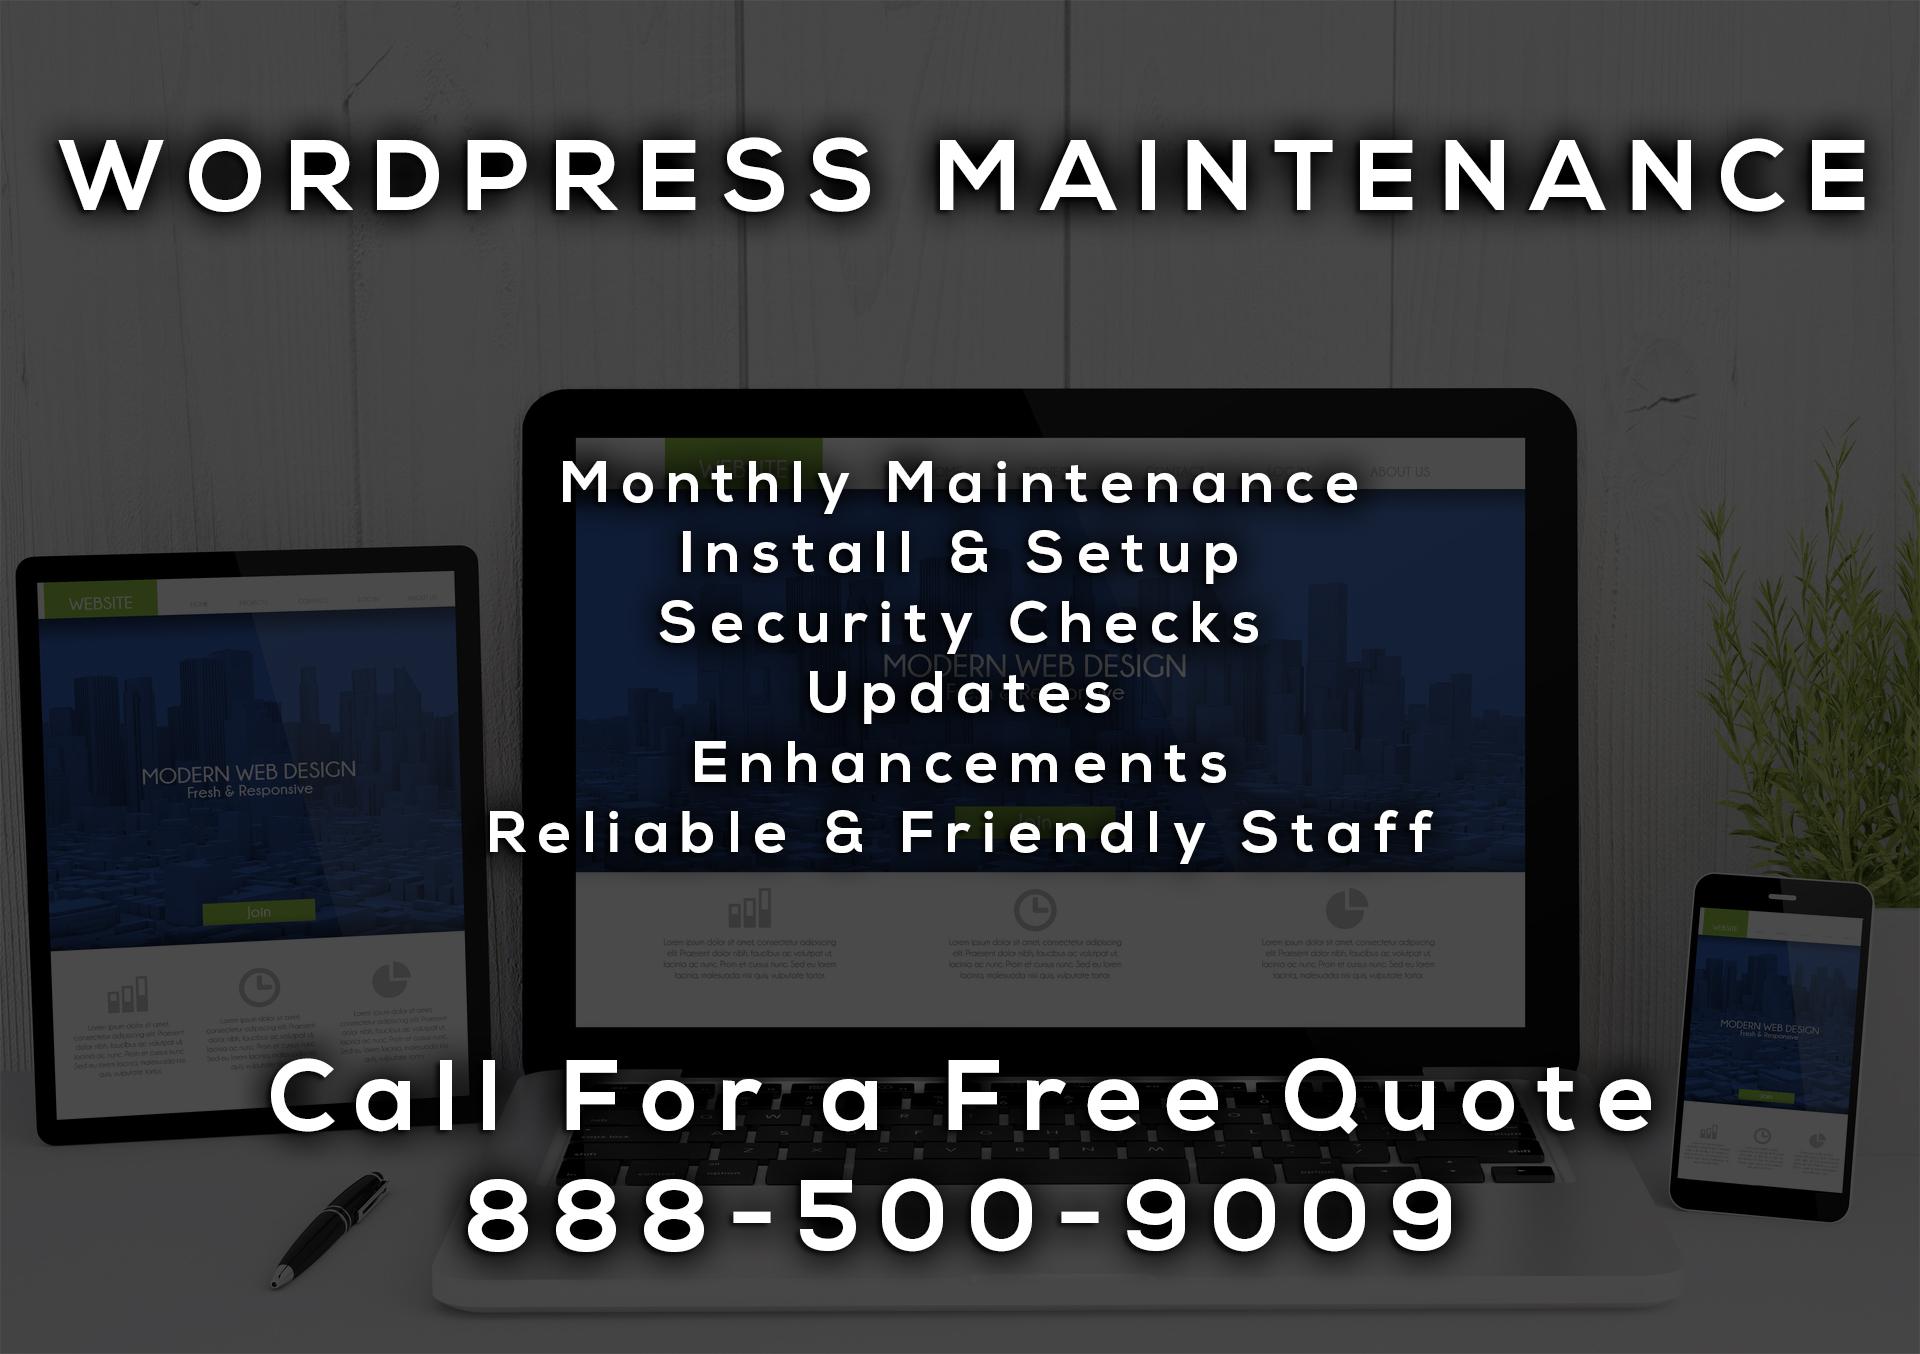 WordPress Maintenance Services Santa Clarita CA